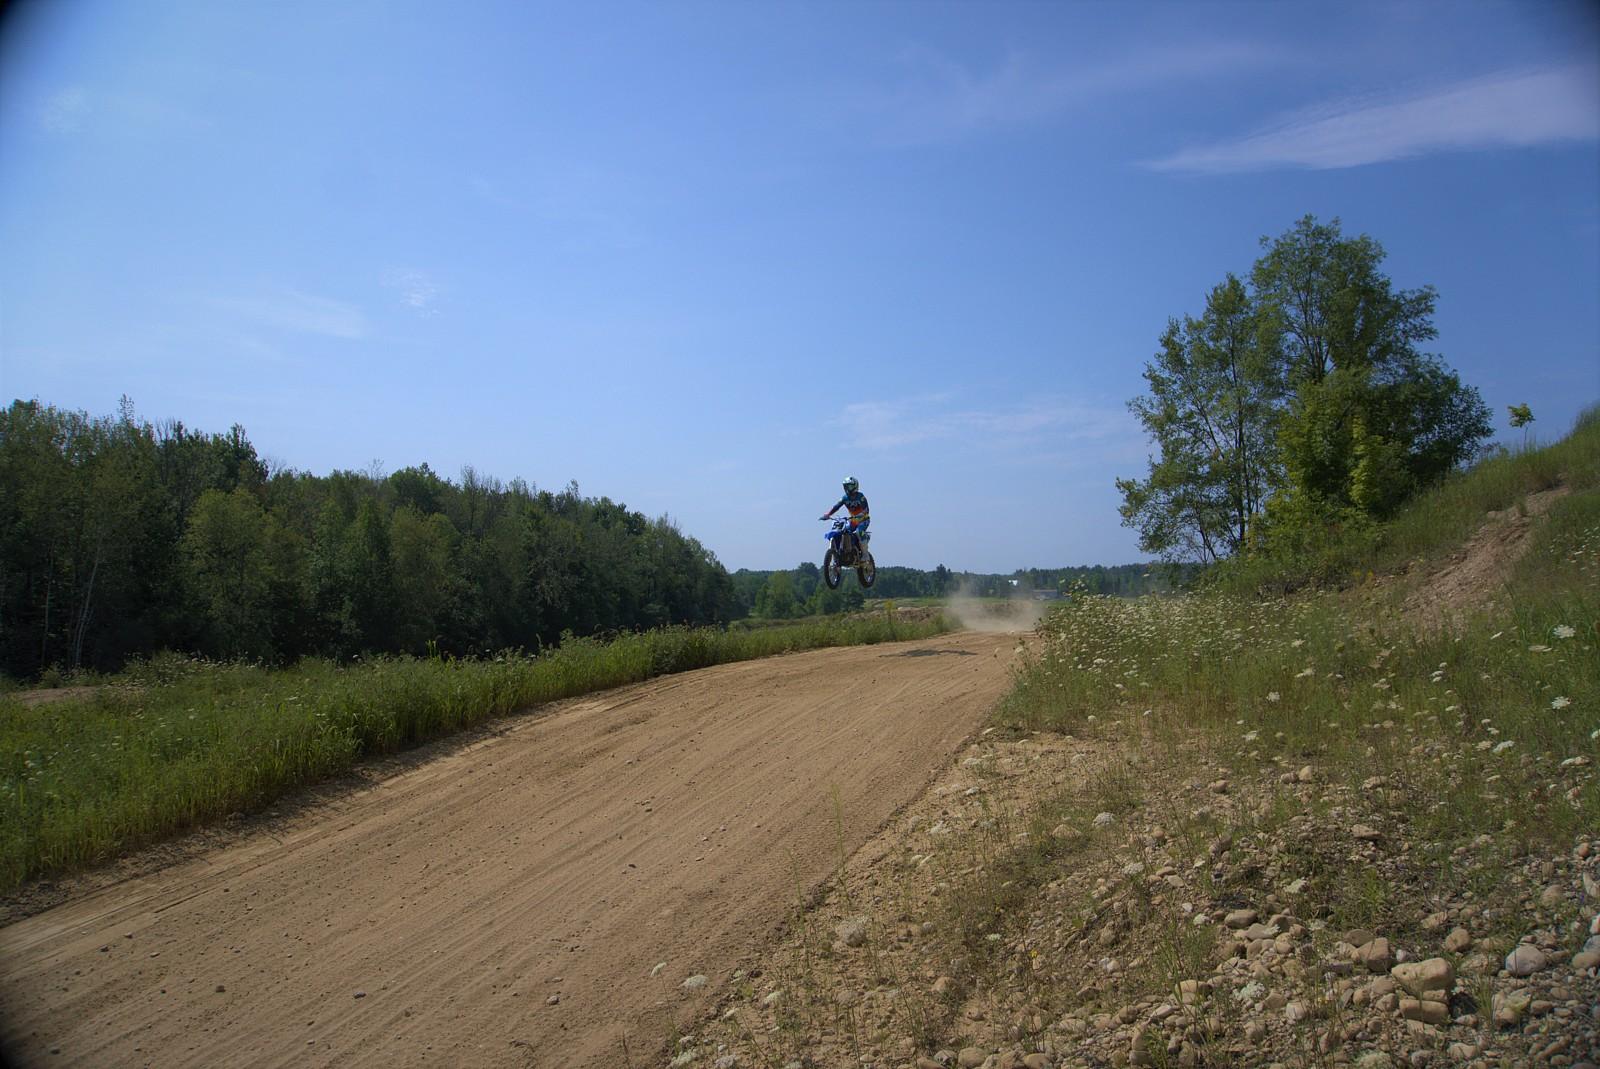 Photo 8 - DawsonBMX54 - Motocross Pictures - Vital MX